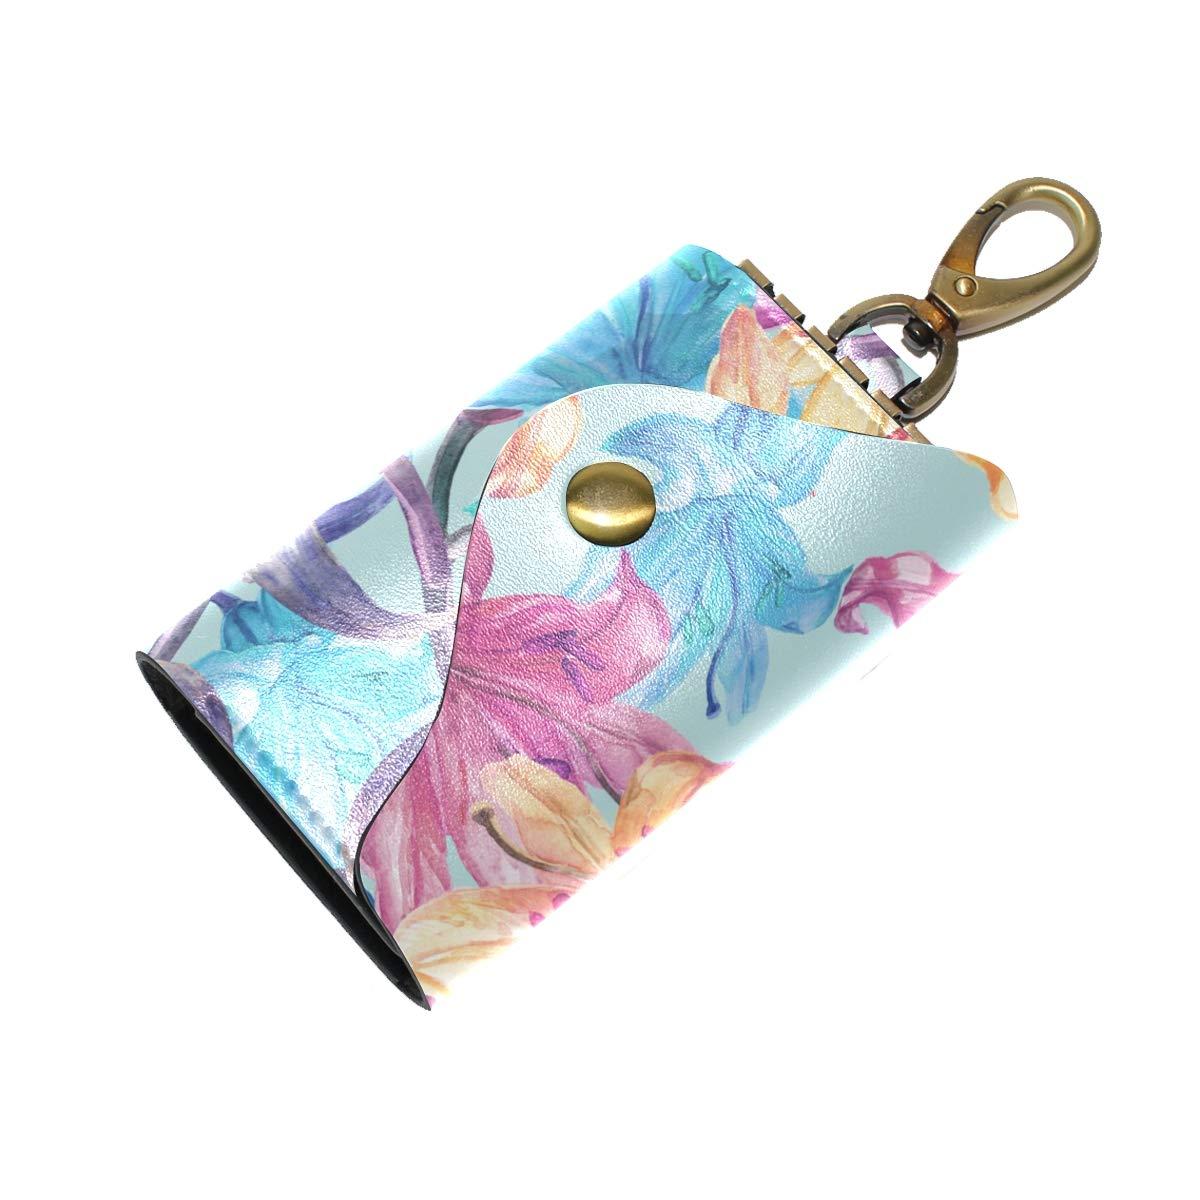 KEAKIA Lily Flowers Pattern Leather Key Case Wallets Tri-fold Key Holder Keychains with 6 Hooks 2 Slot Snap Closure for Men Women